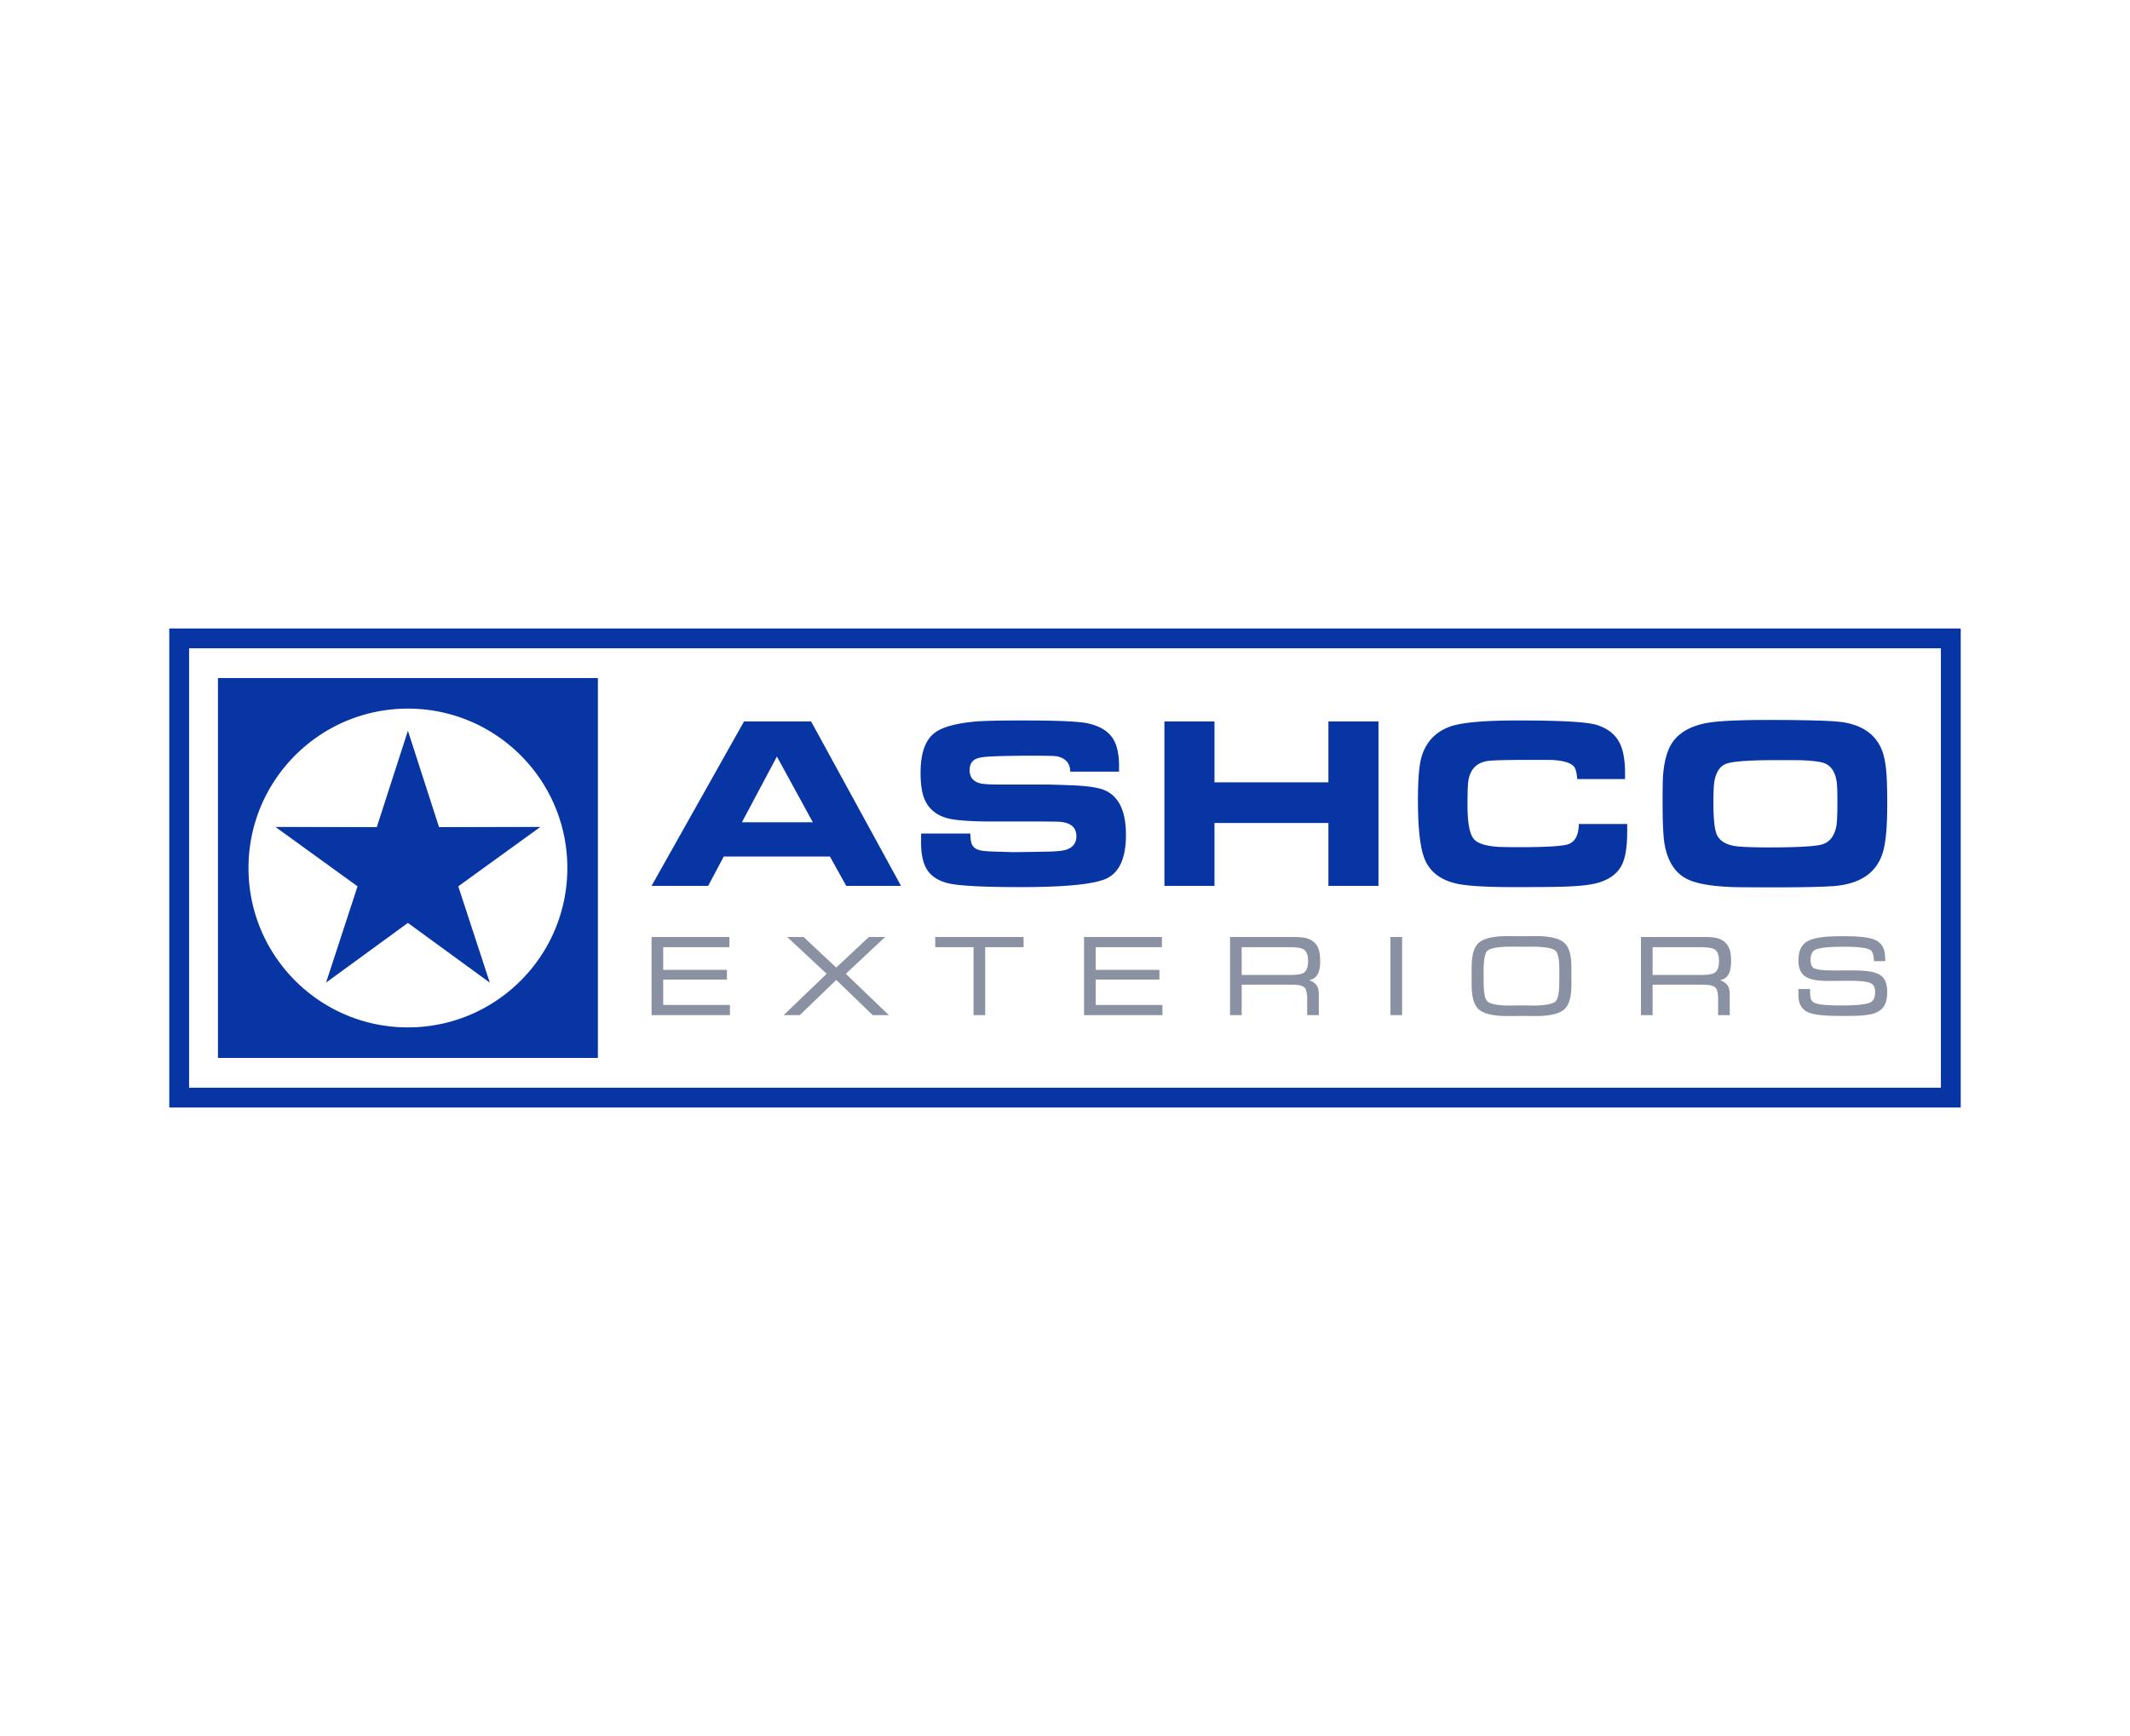 Star based logo for home-restoration company